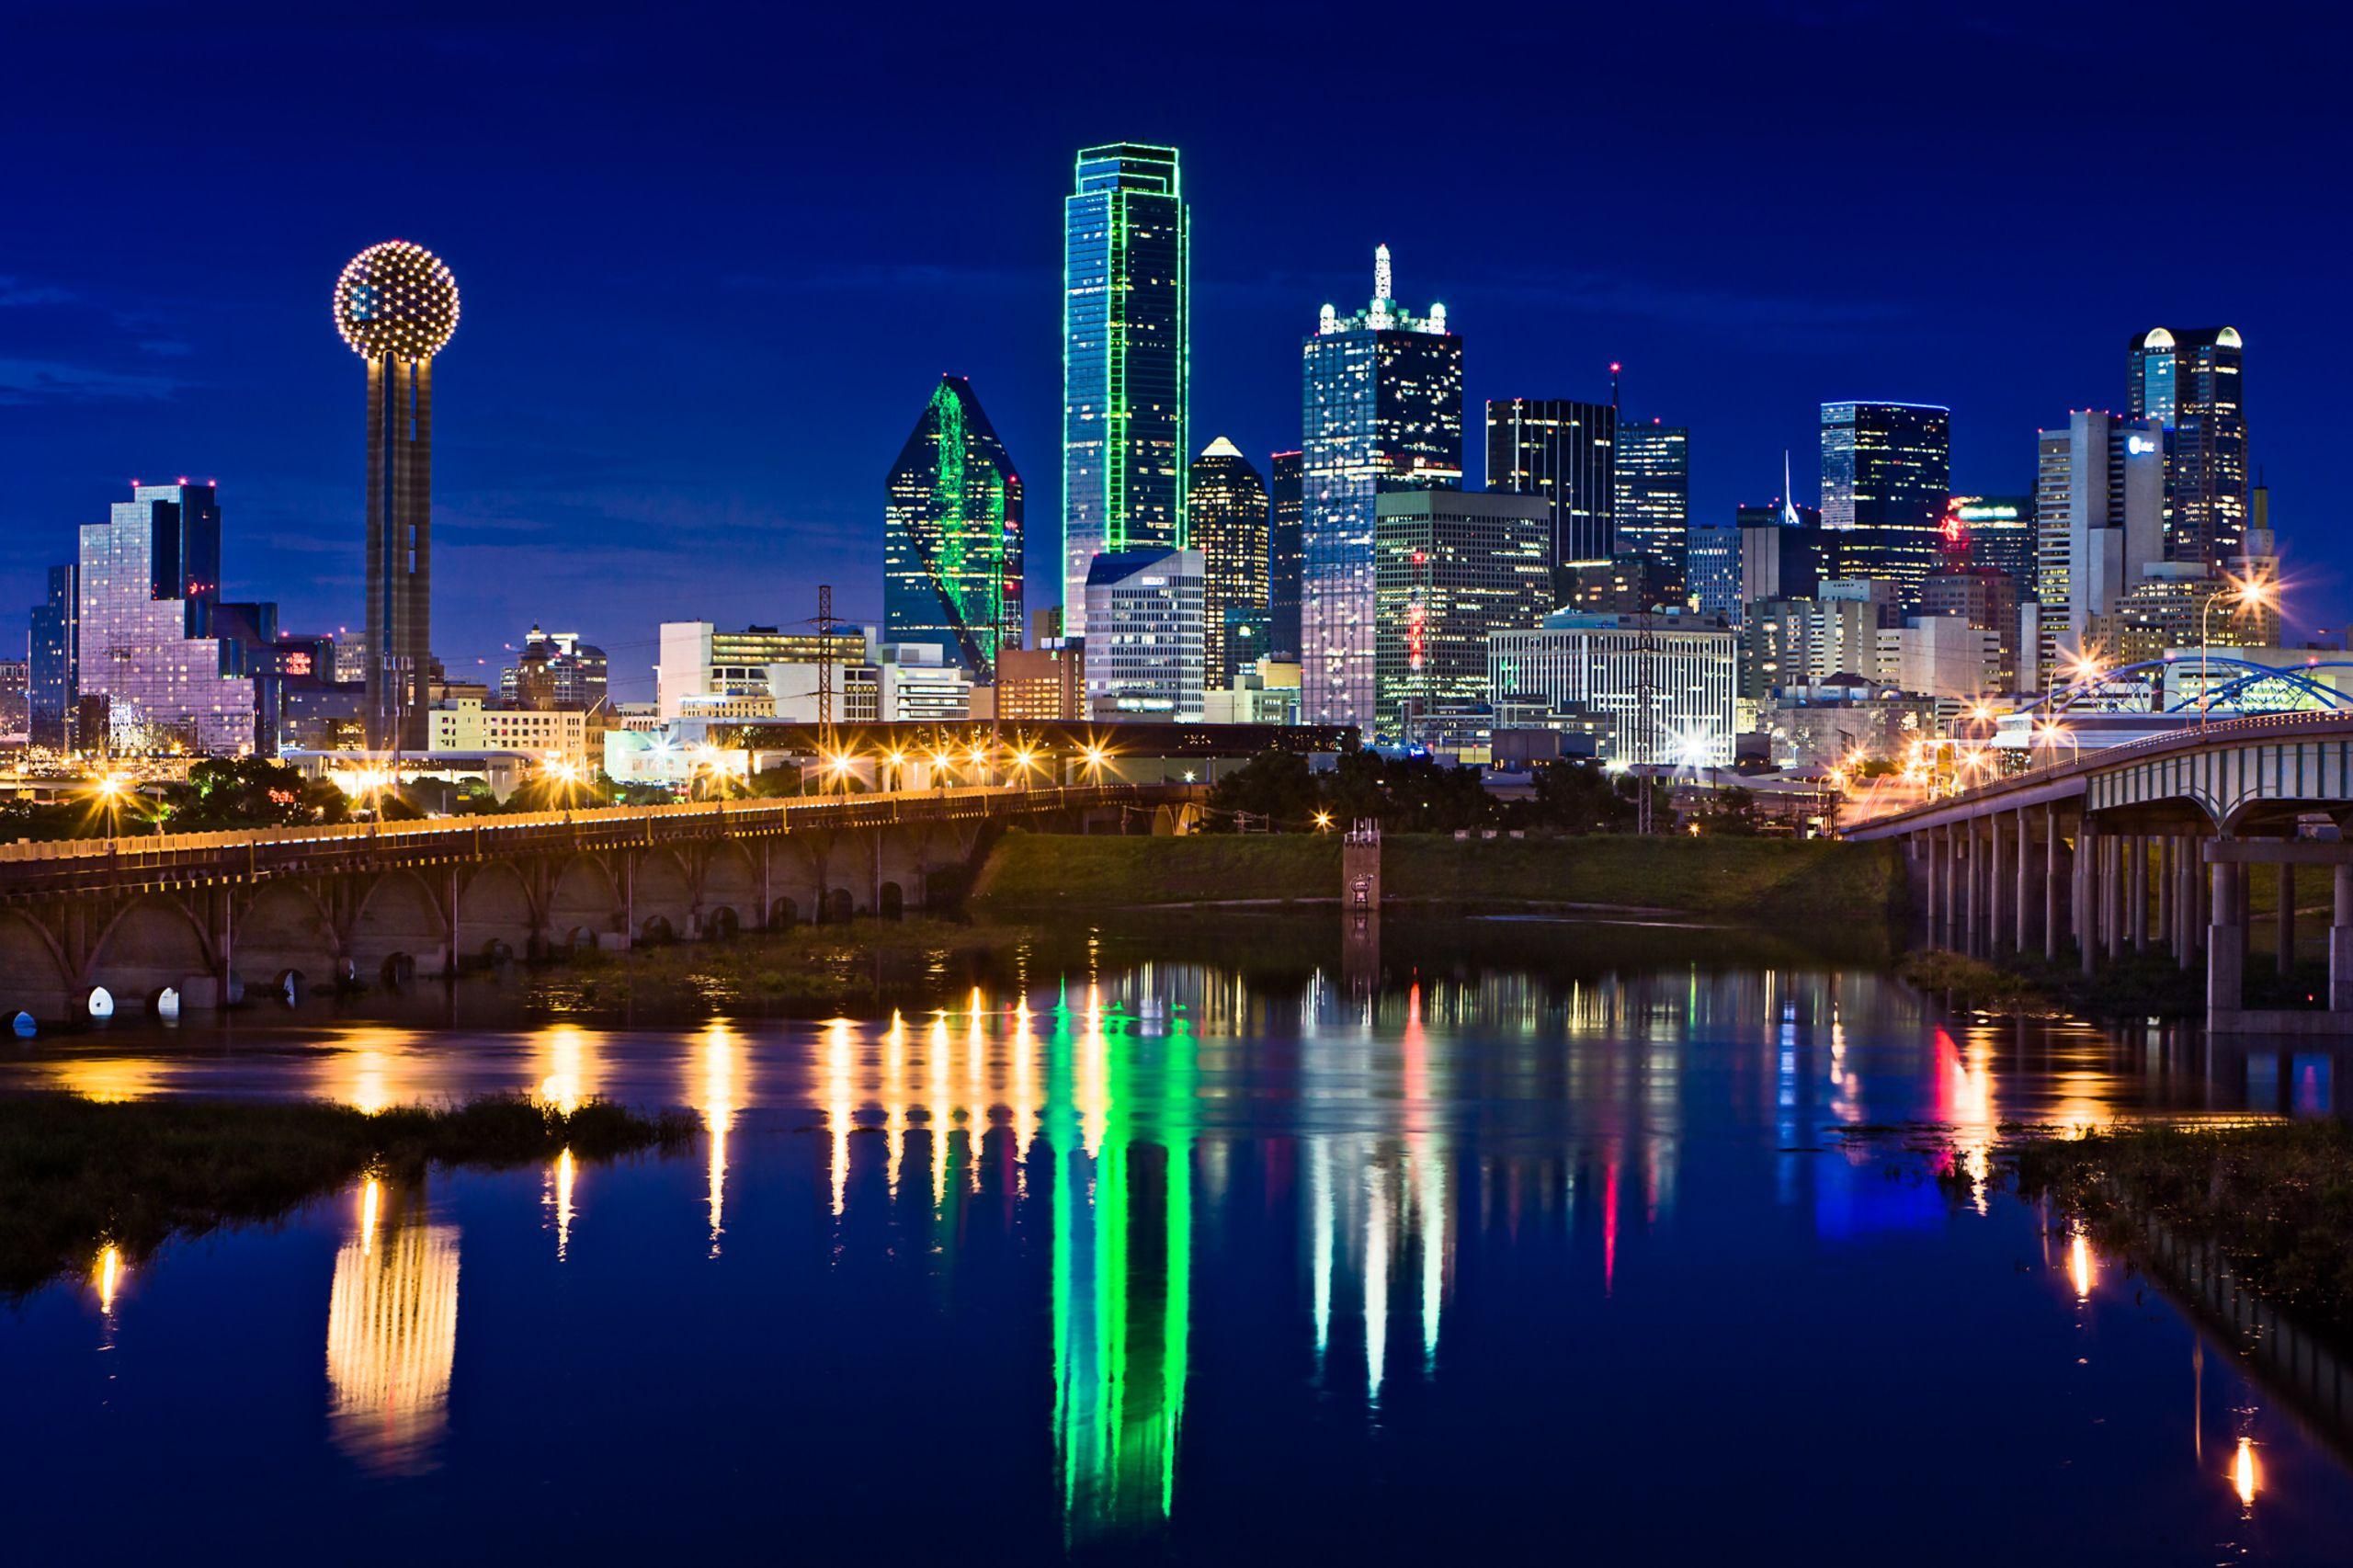 The Heart of Dallas Texas